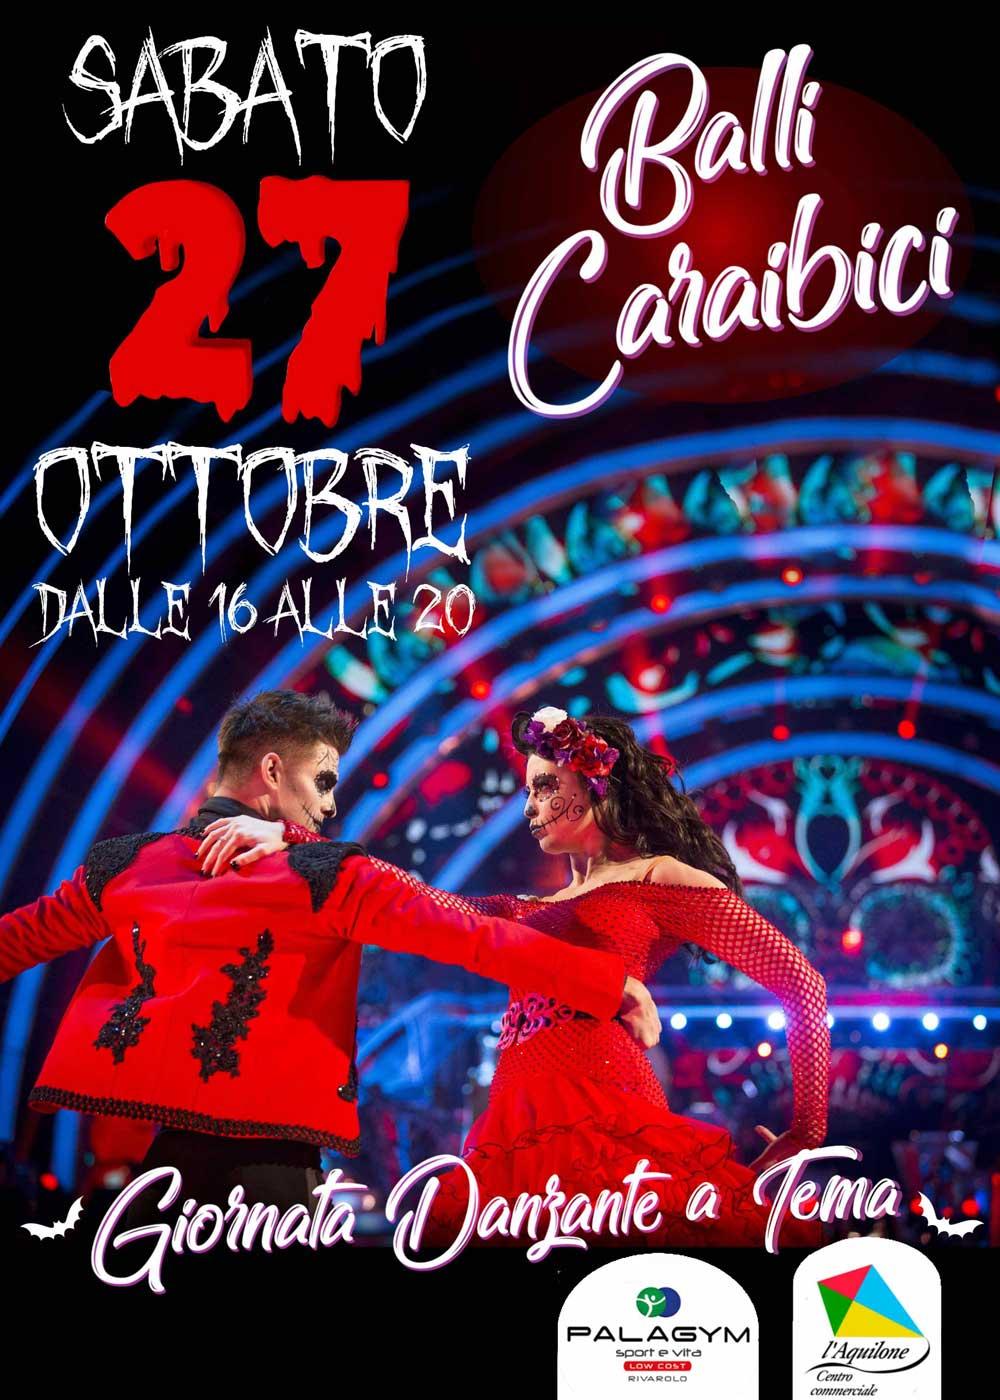 caraibici halloween 27 ottobre